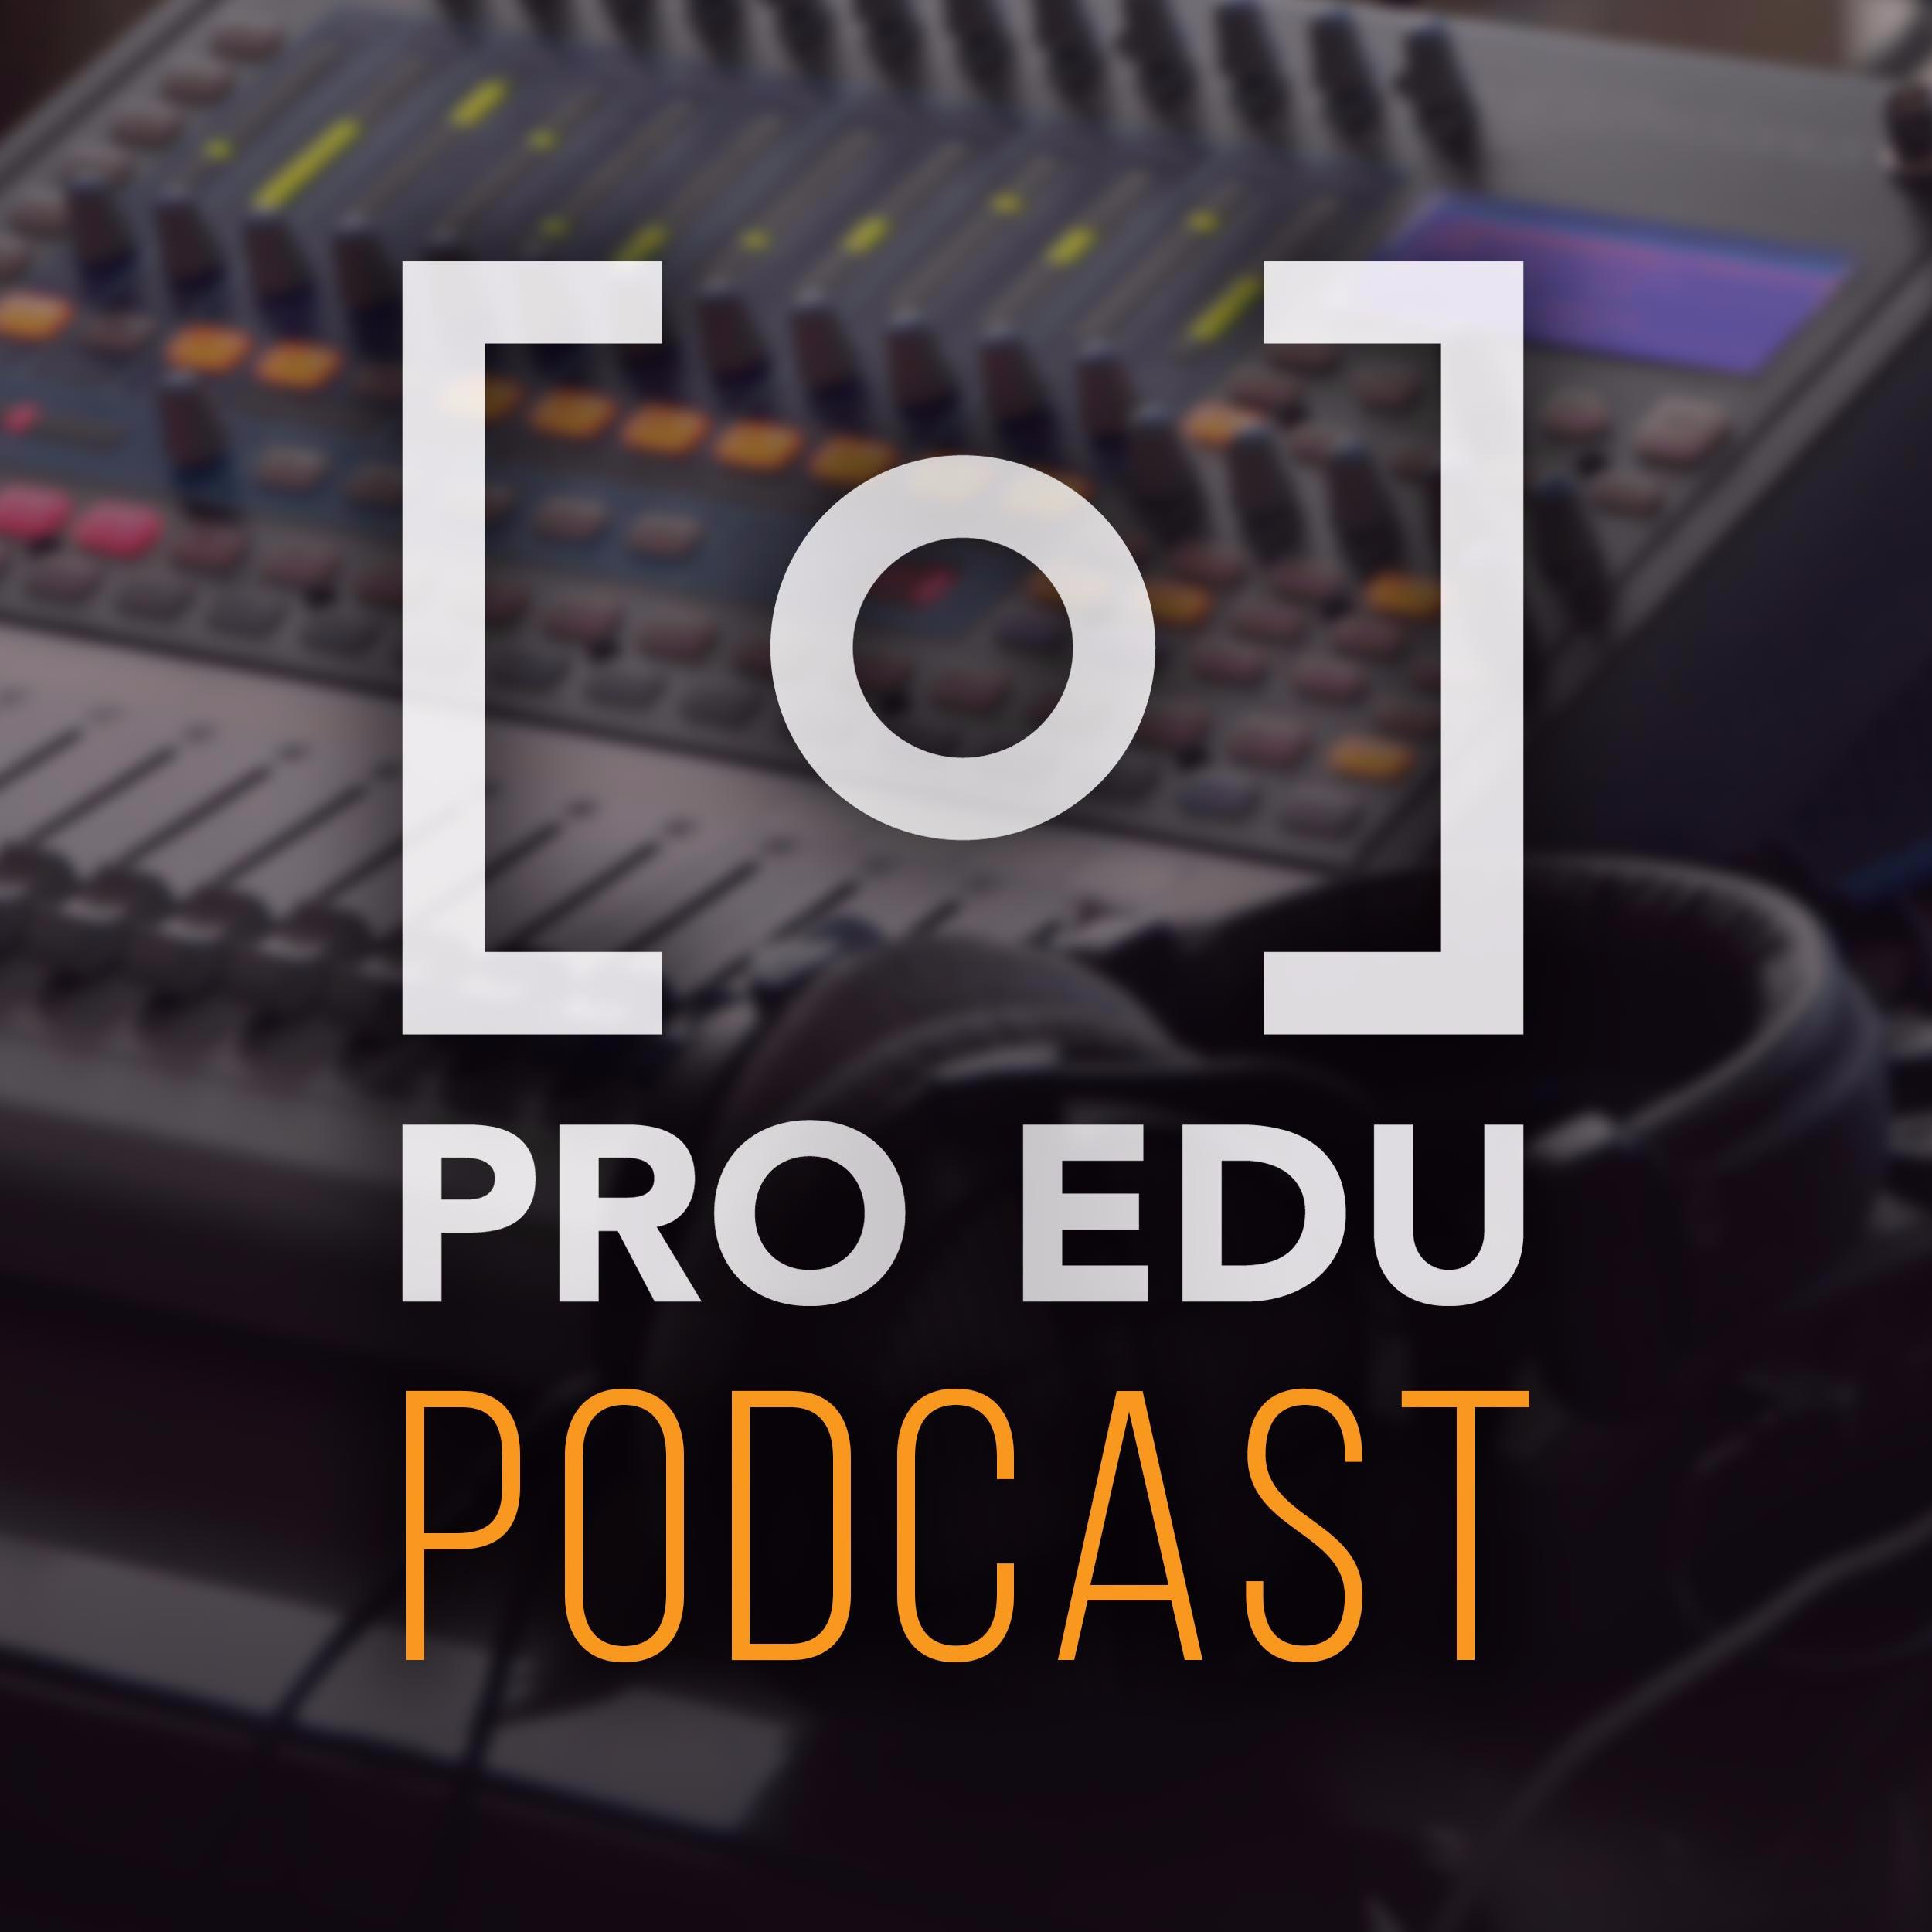 Chris Crisman - Episode 125 The PRO EDU Photography & Retouching Podcast